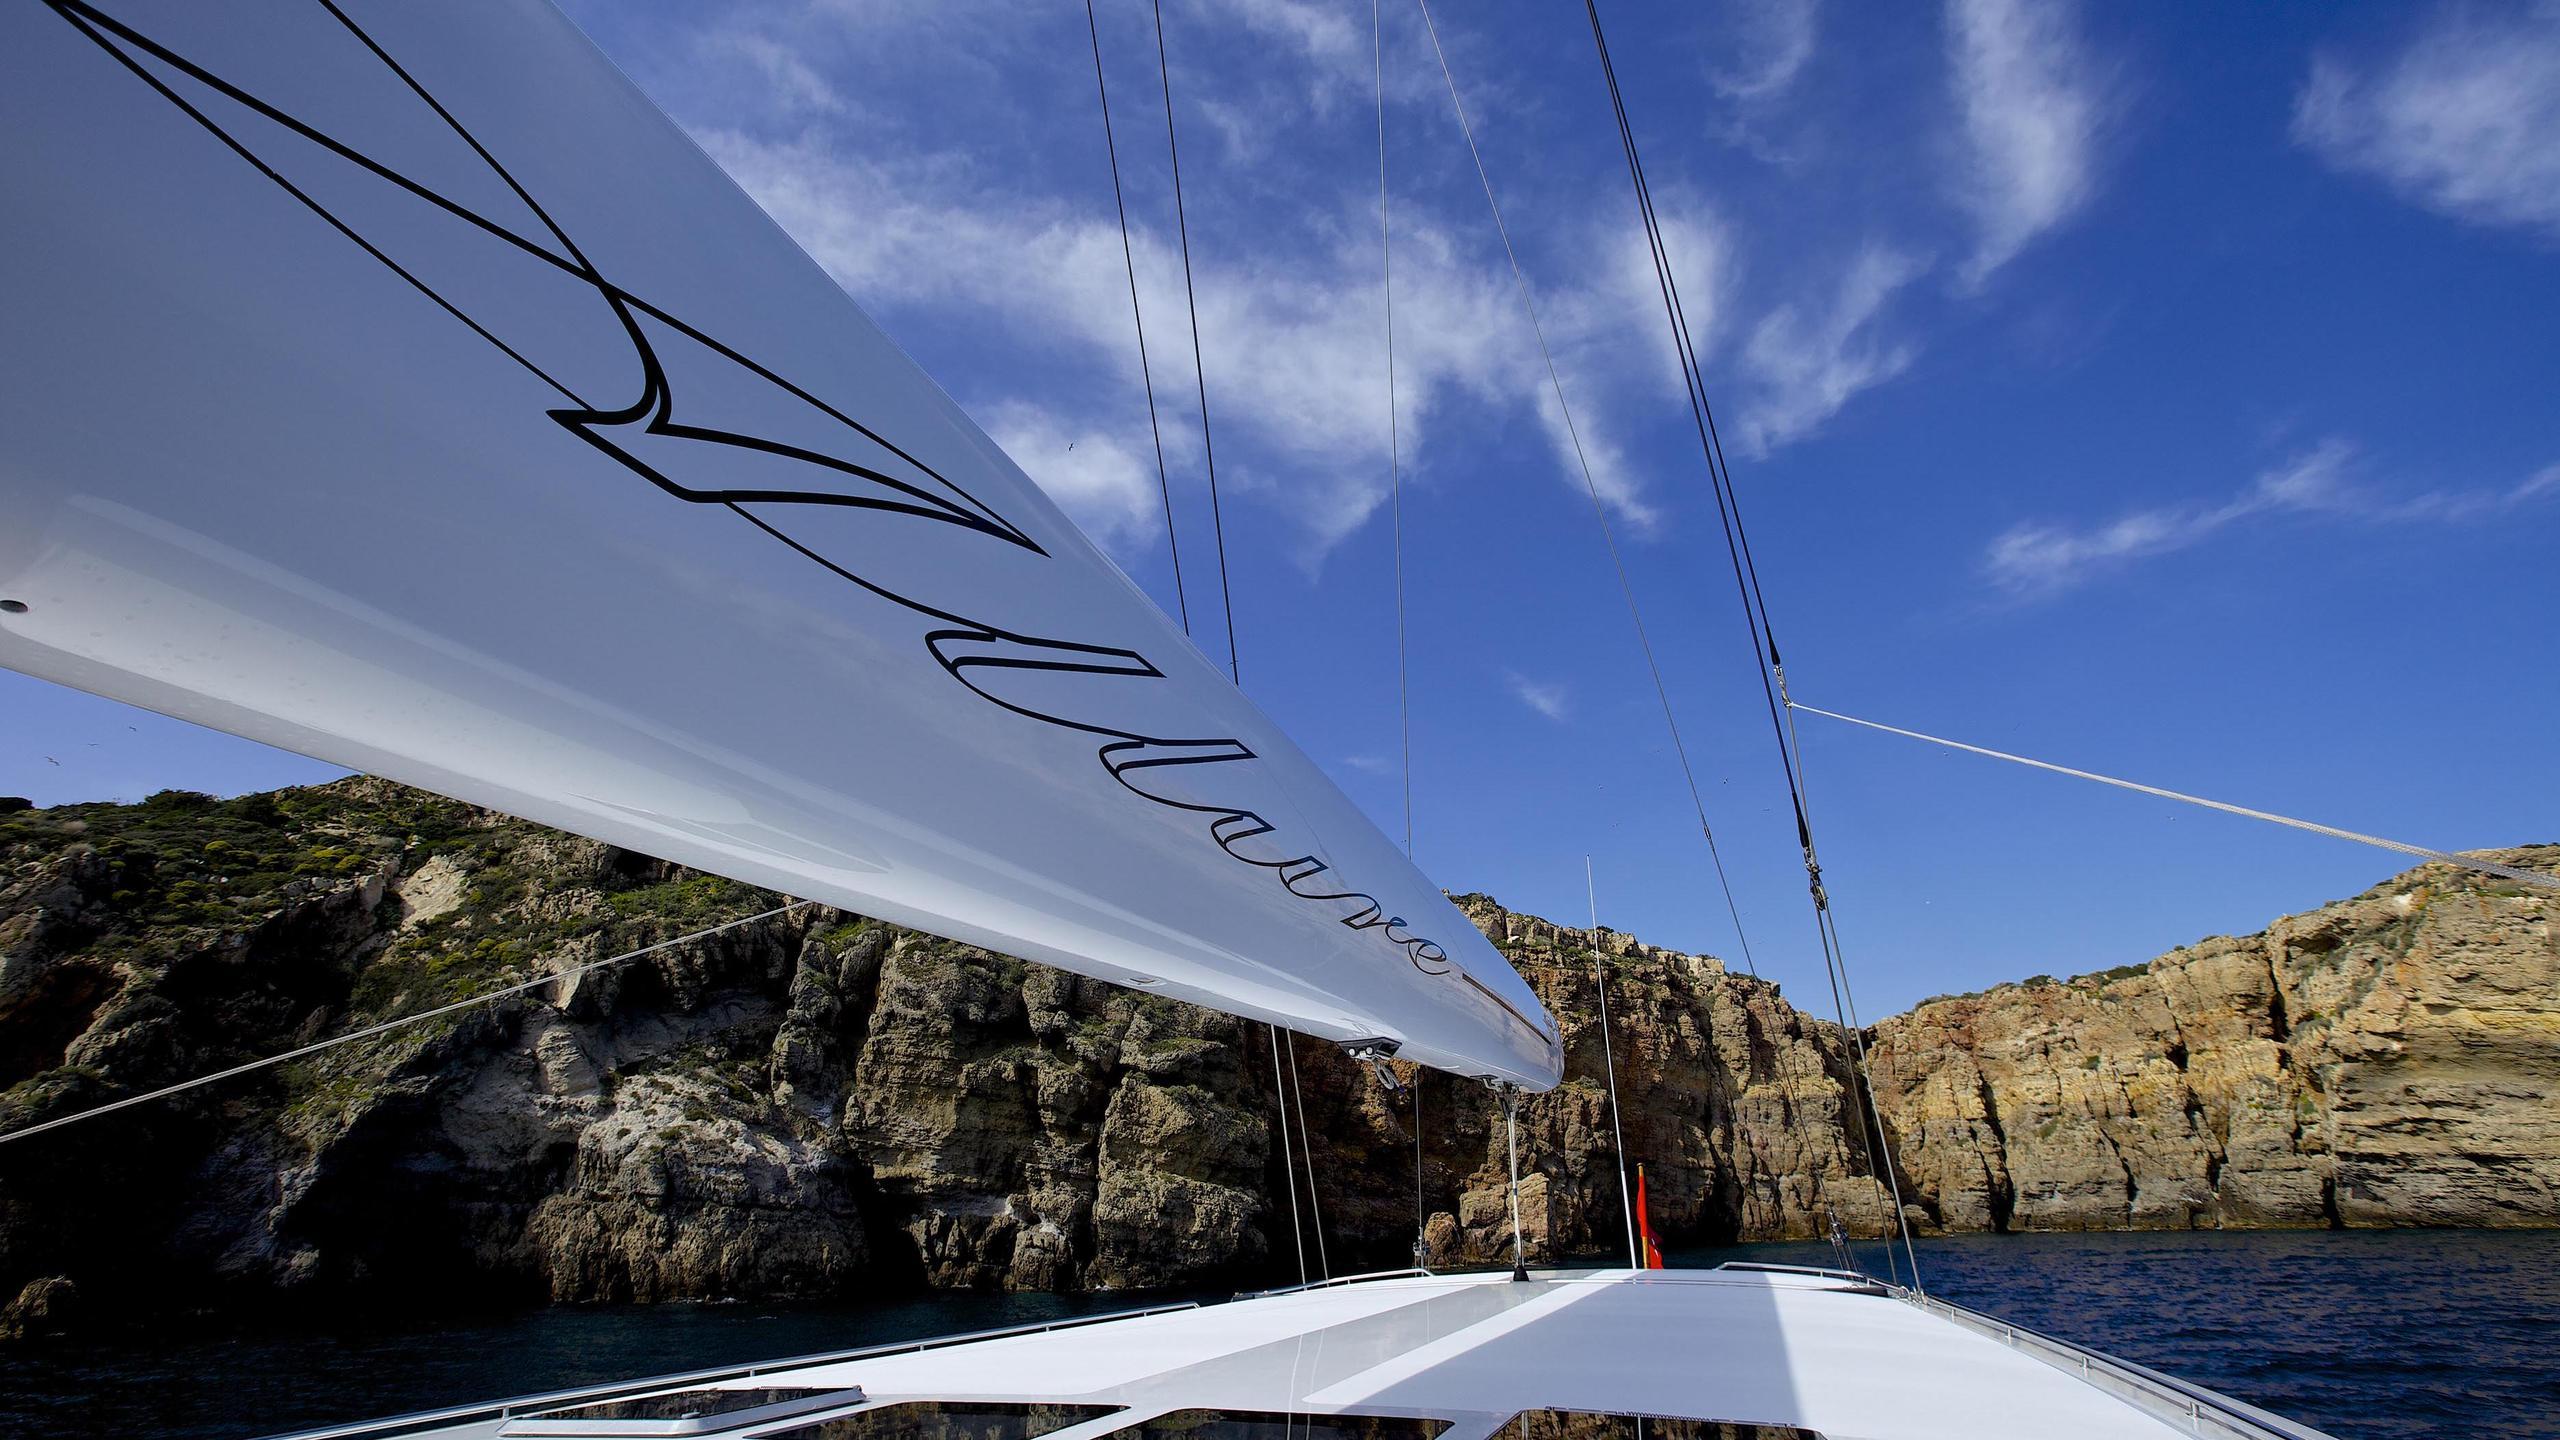 allure-yacht-mast